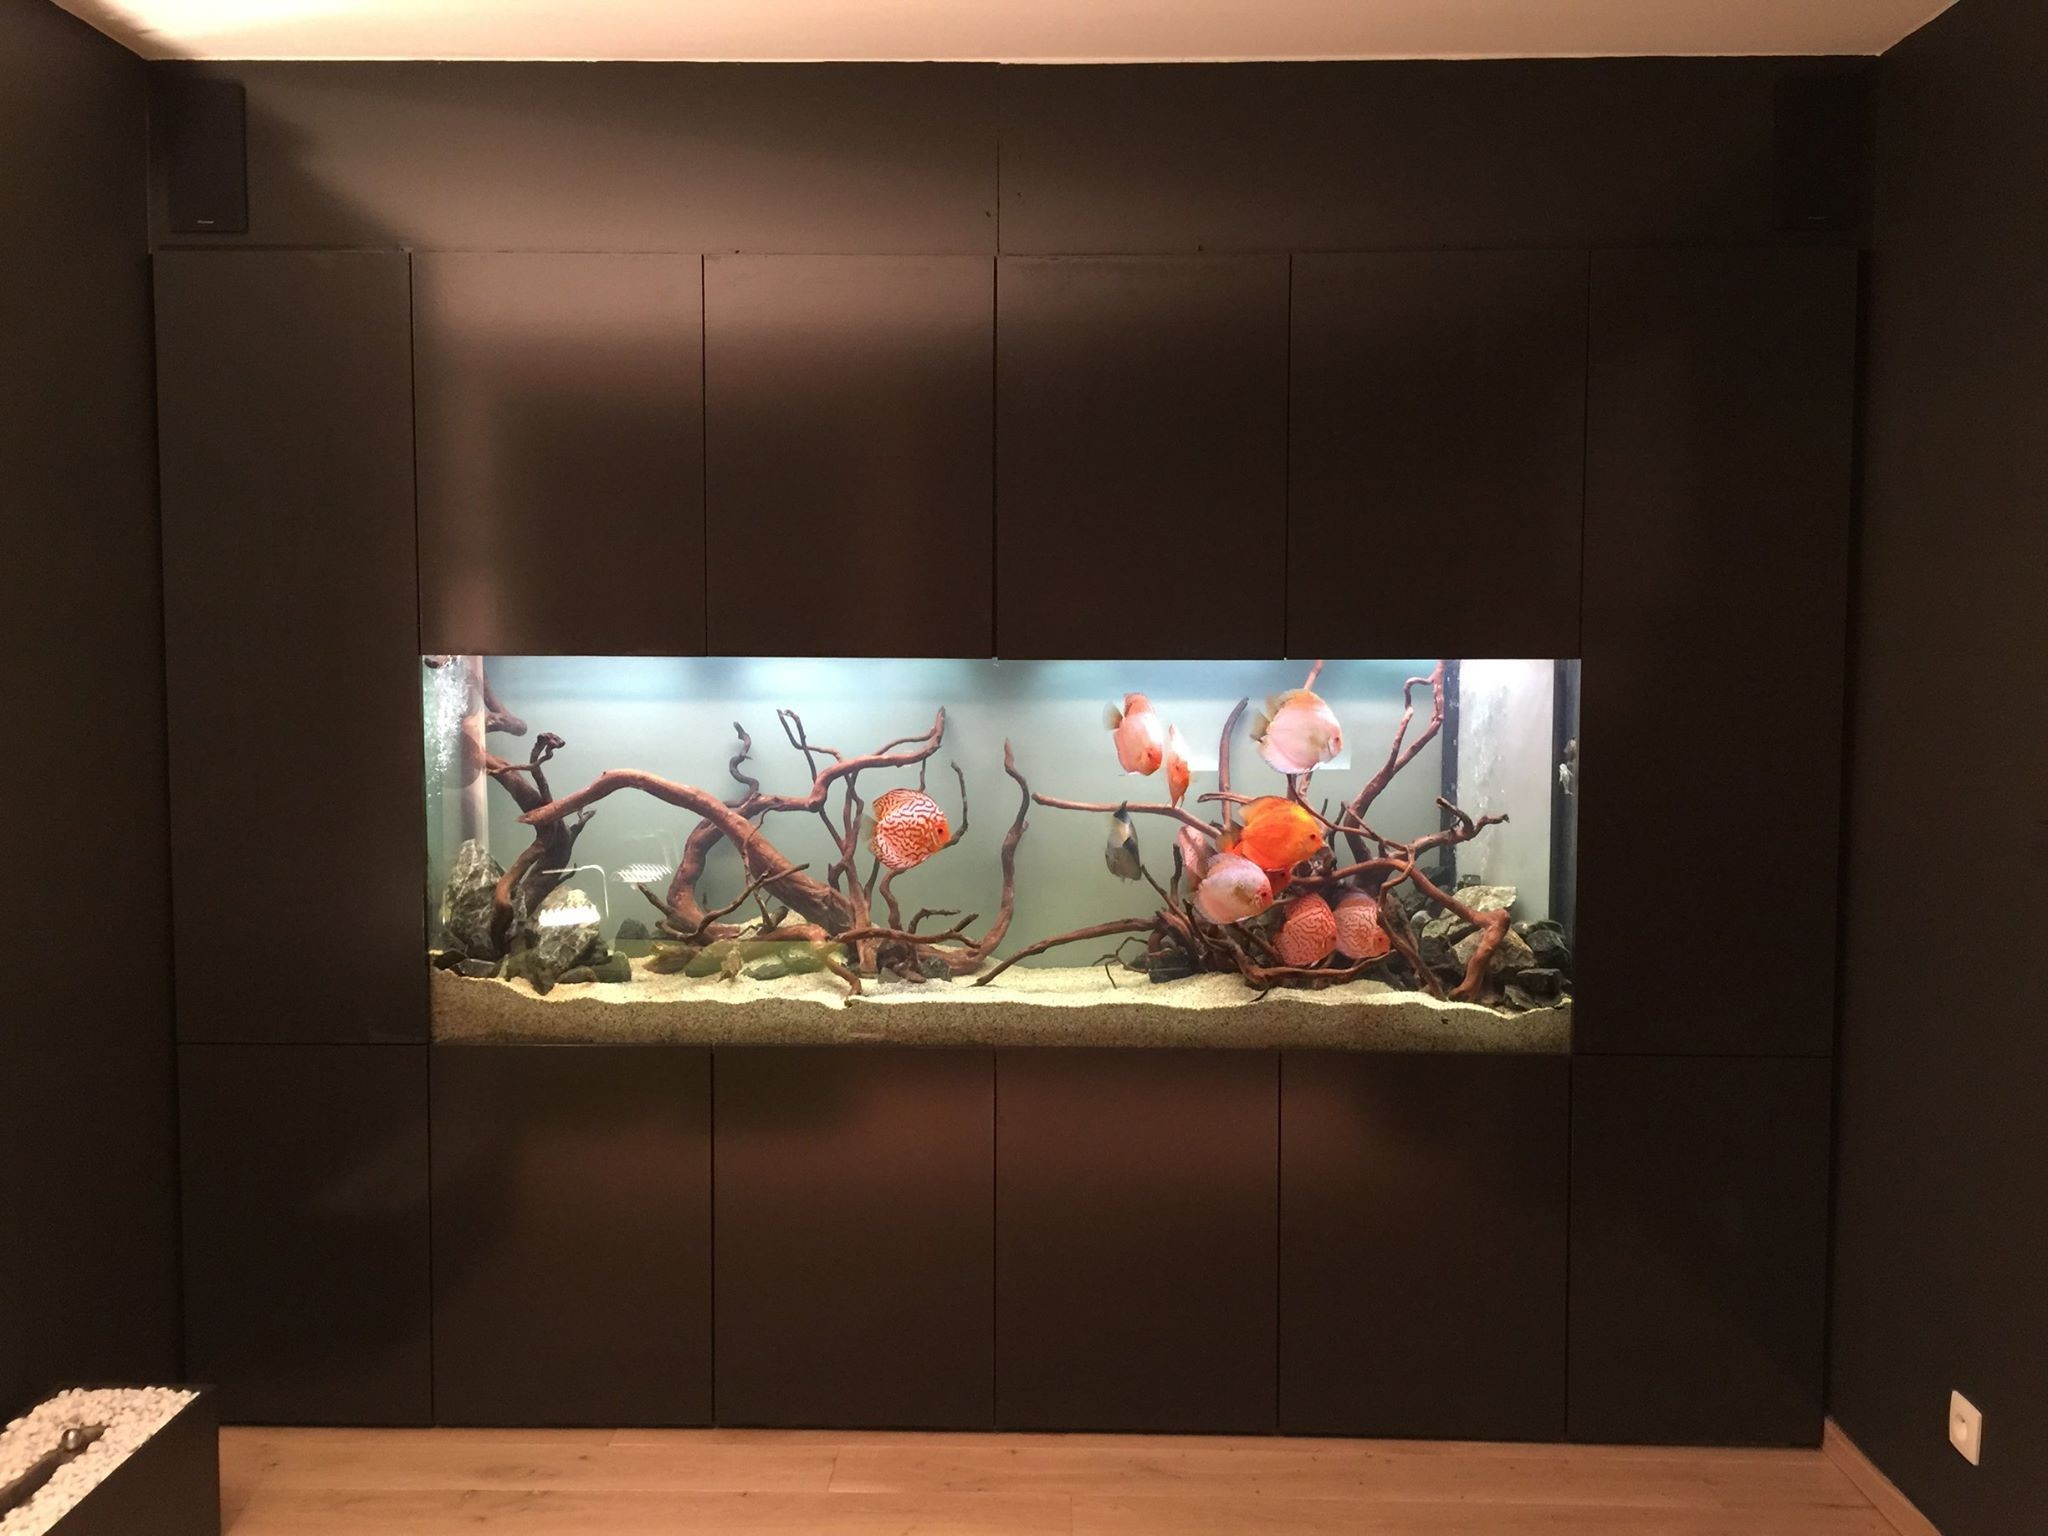 Design Aquarium Kast : Kast rond aquarium google zoeken wandkast pinterest aquariums